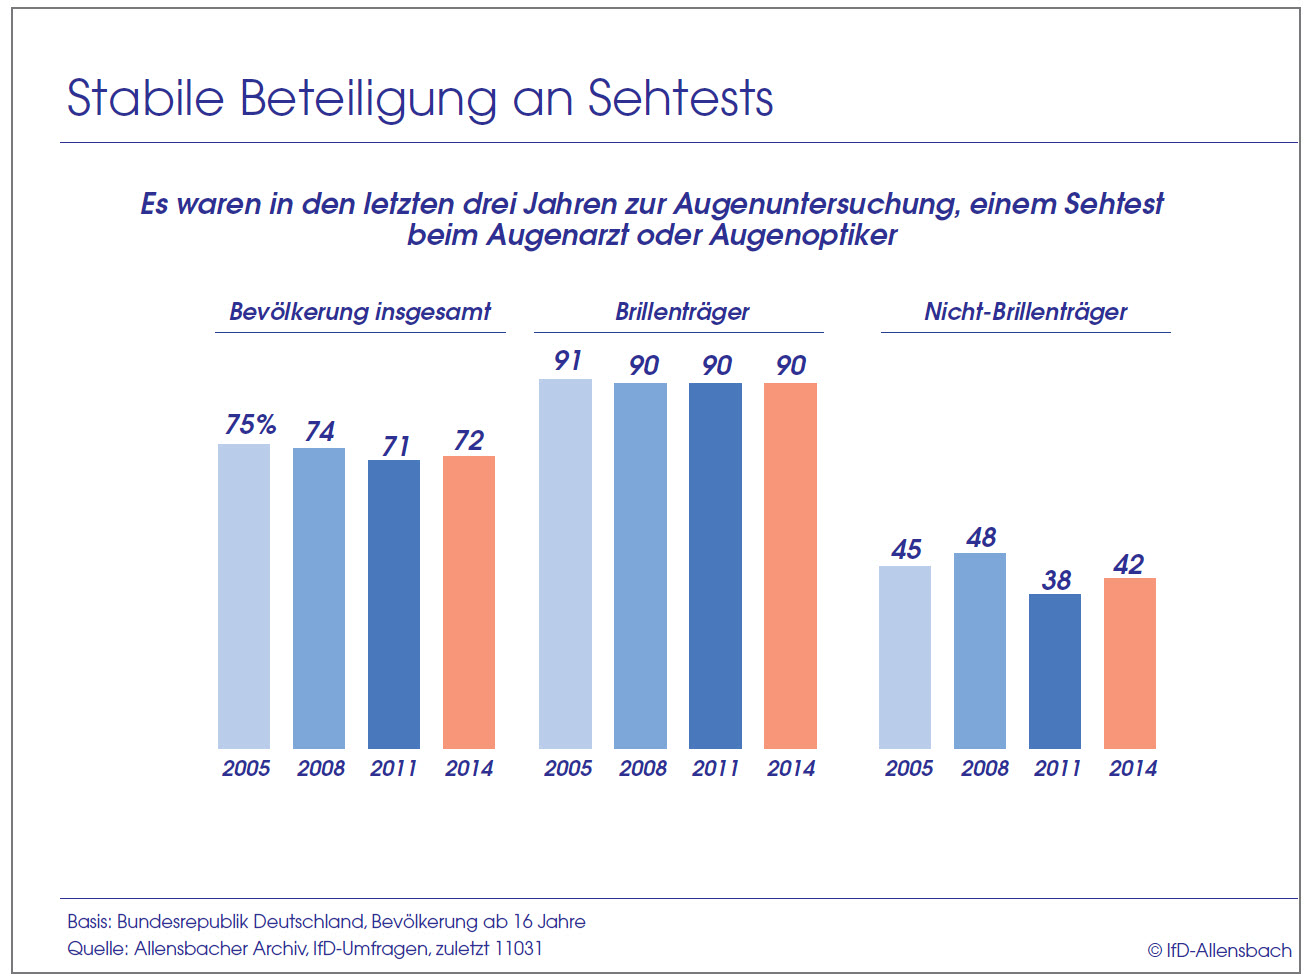 Grafik über die Beteiligung an Sehtests in Deutschland